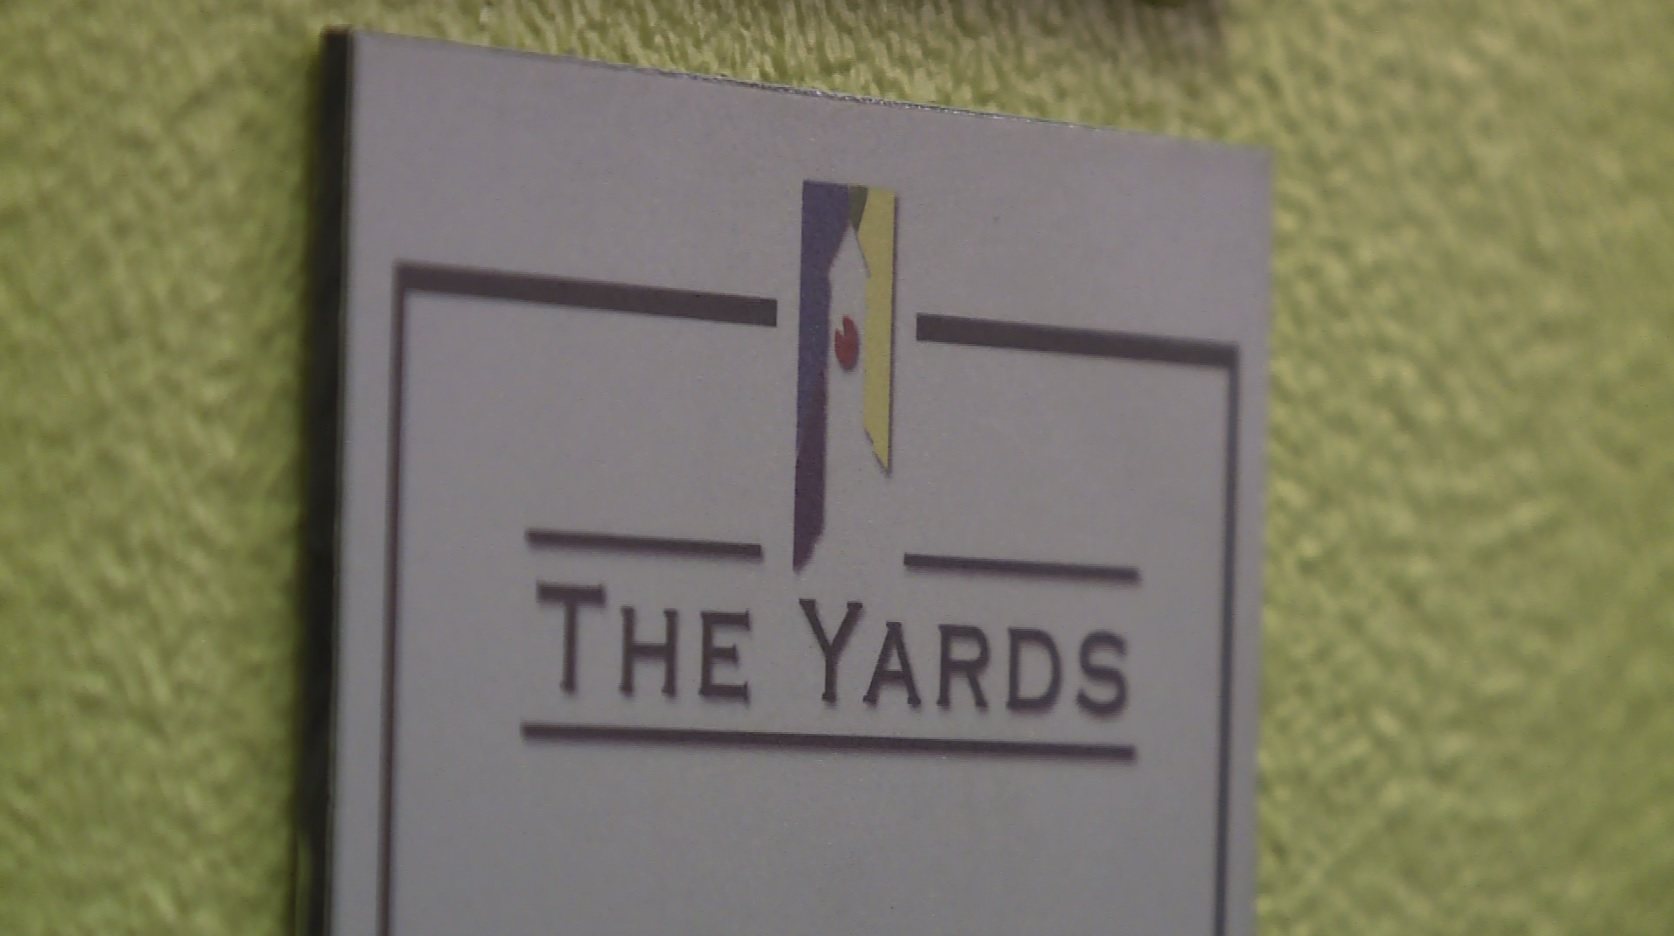 the yards apartments_1560984321065.jpg.jpg